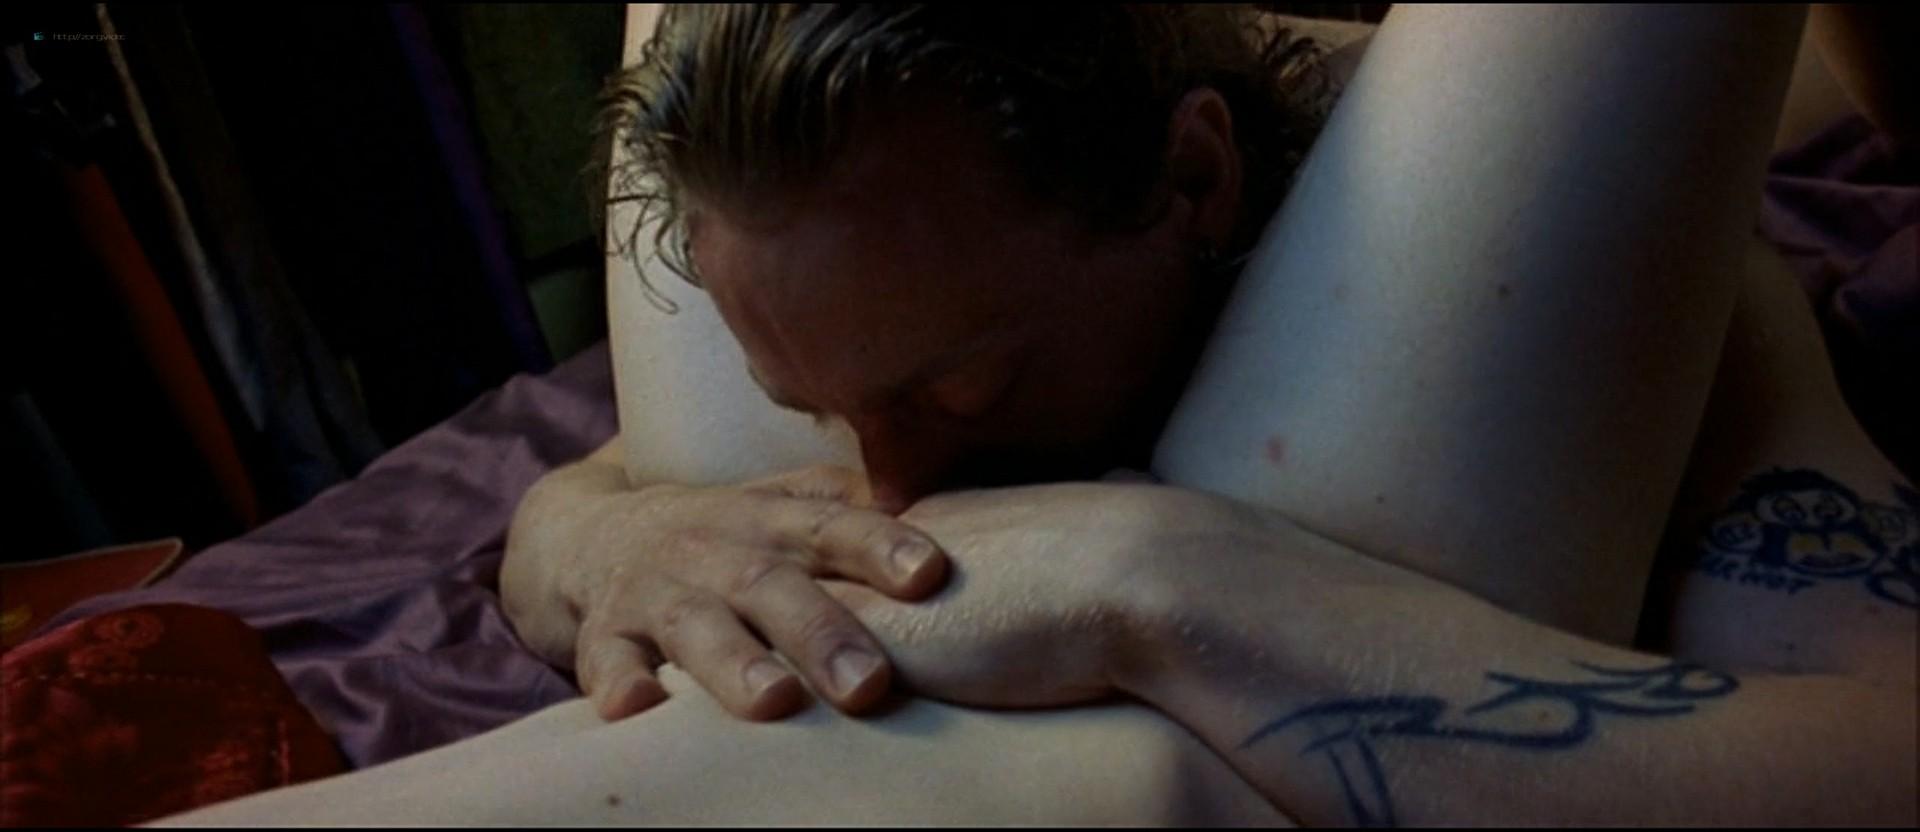 Signe Egholm Olsen nude hot sex Pernille Vallentin nude sex too - Nordkraft (DK-2005) HD 1080p Web (12)